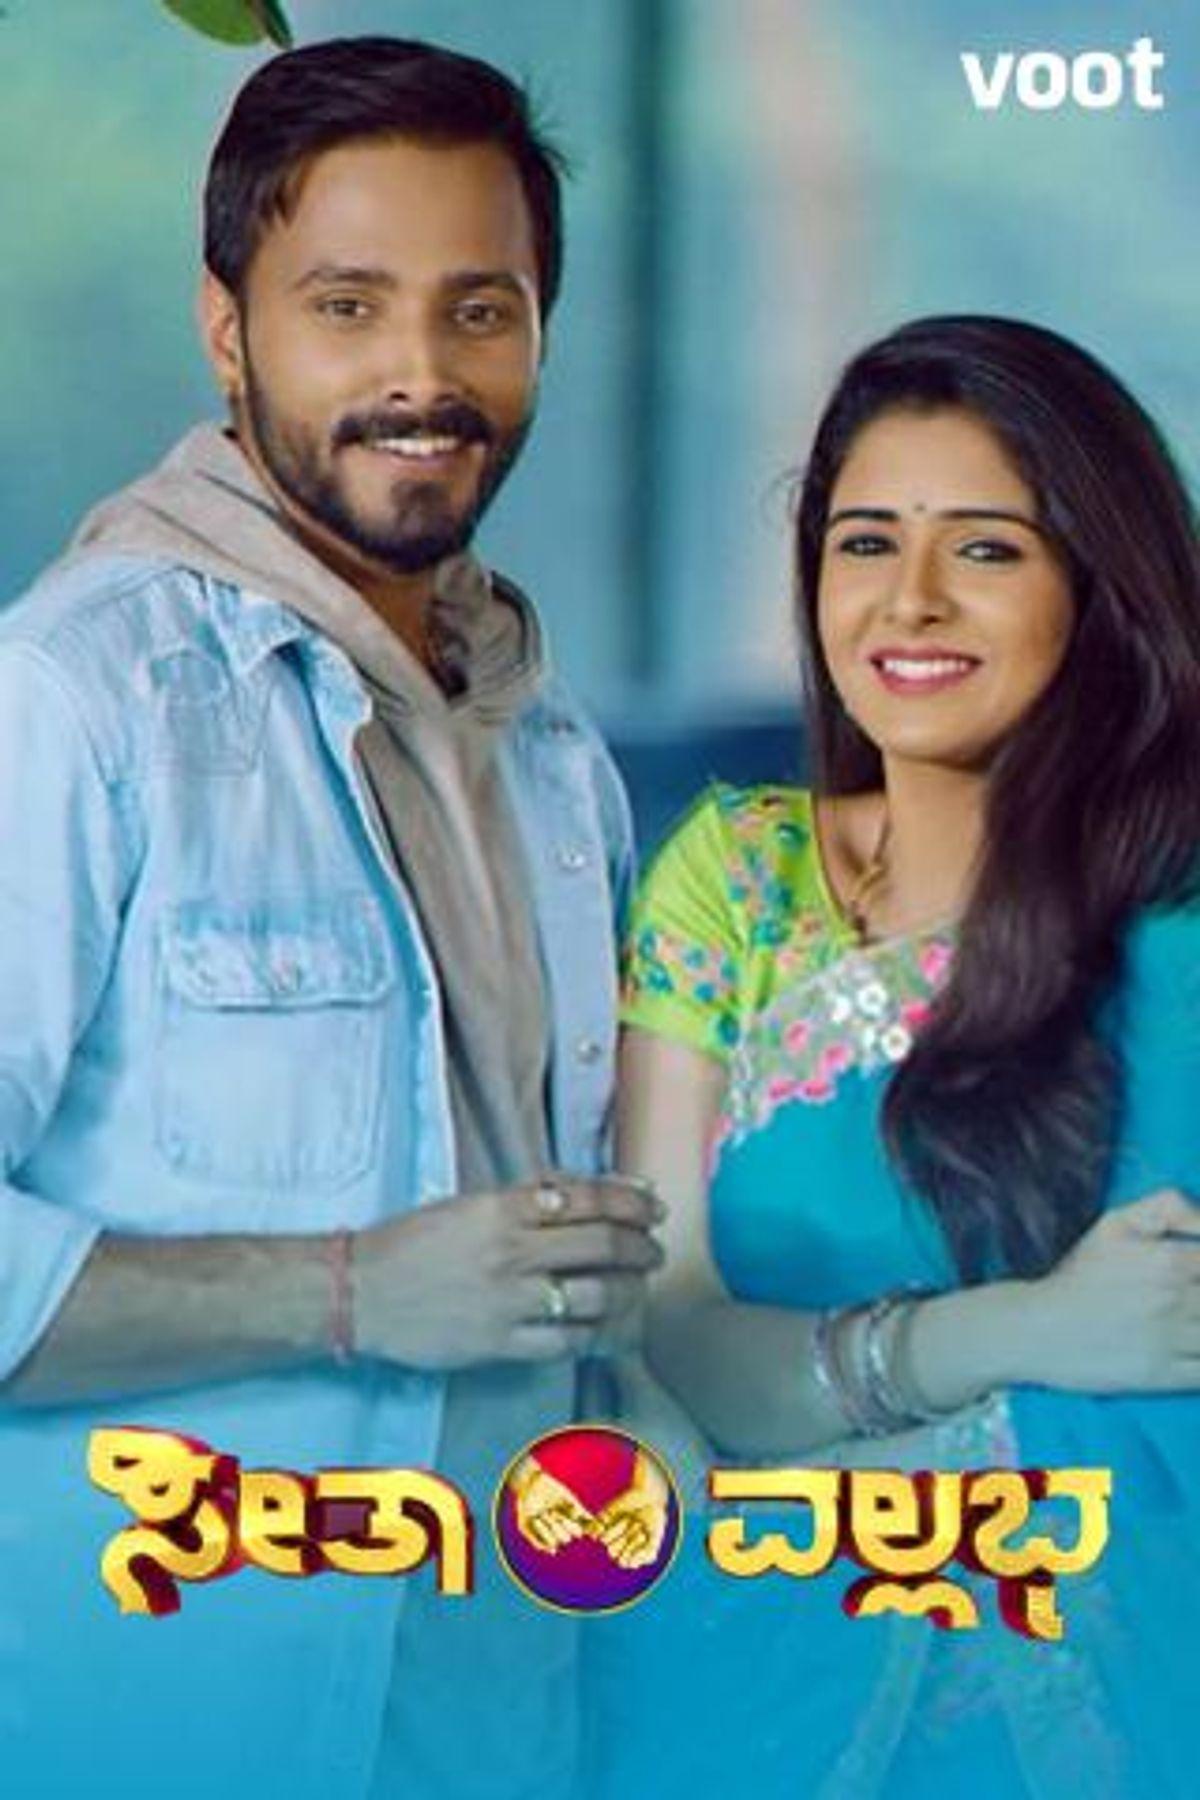 Supritha Sathyanarayan Best Movies, TV Shows and Web Series List